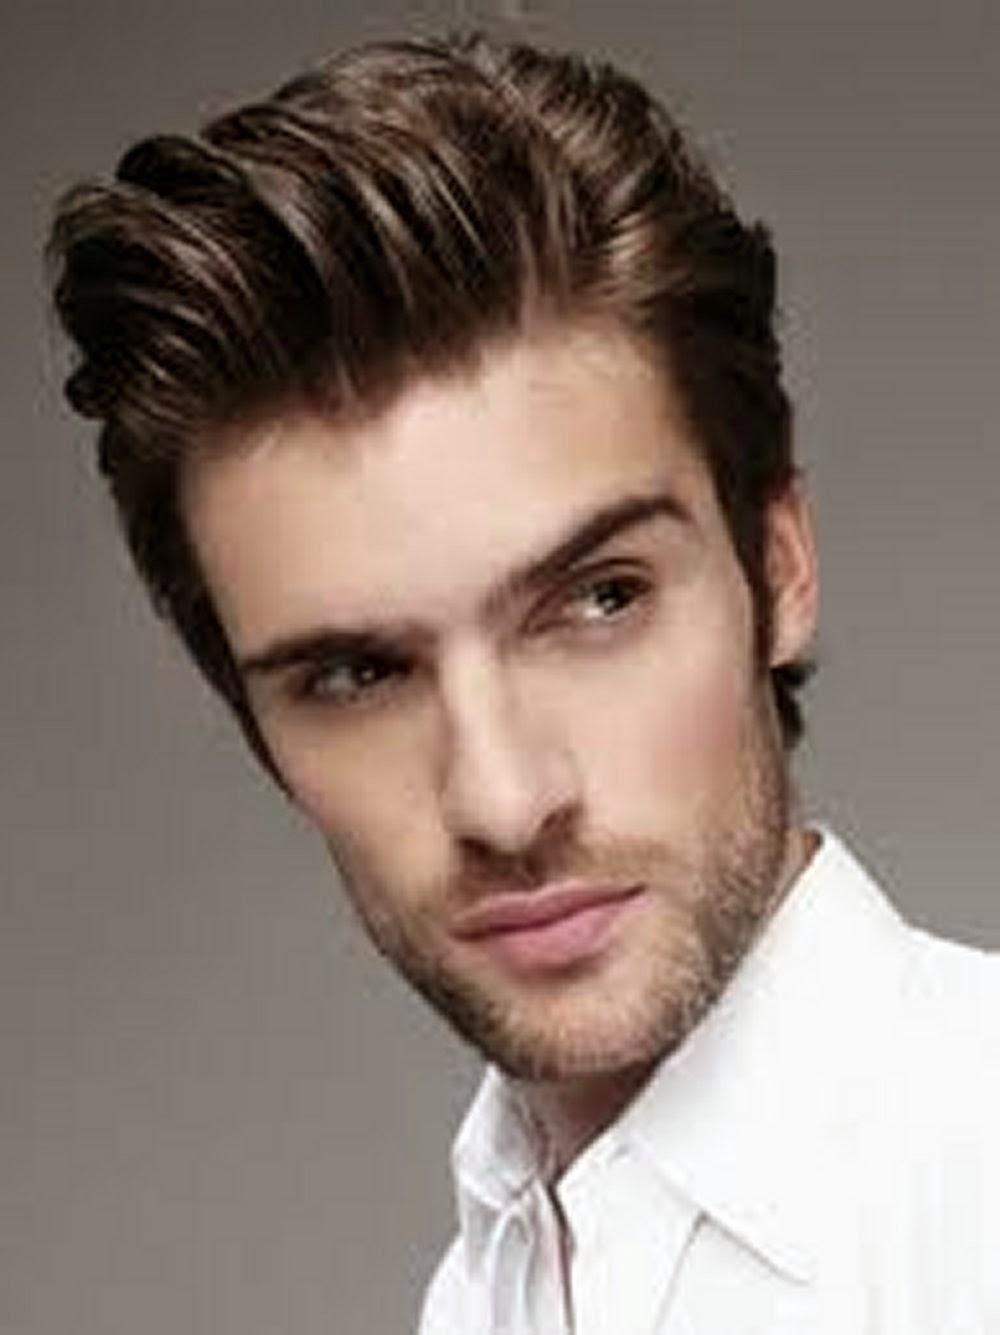 Groovy 2014 Trendy Haircuts For Men Latest Hairstyles Short Hairstyles Gunalazisus